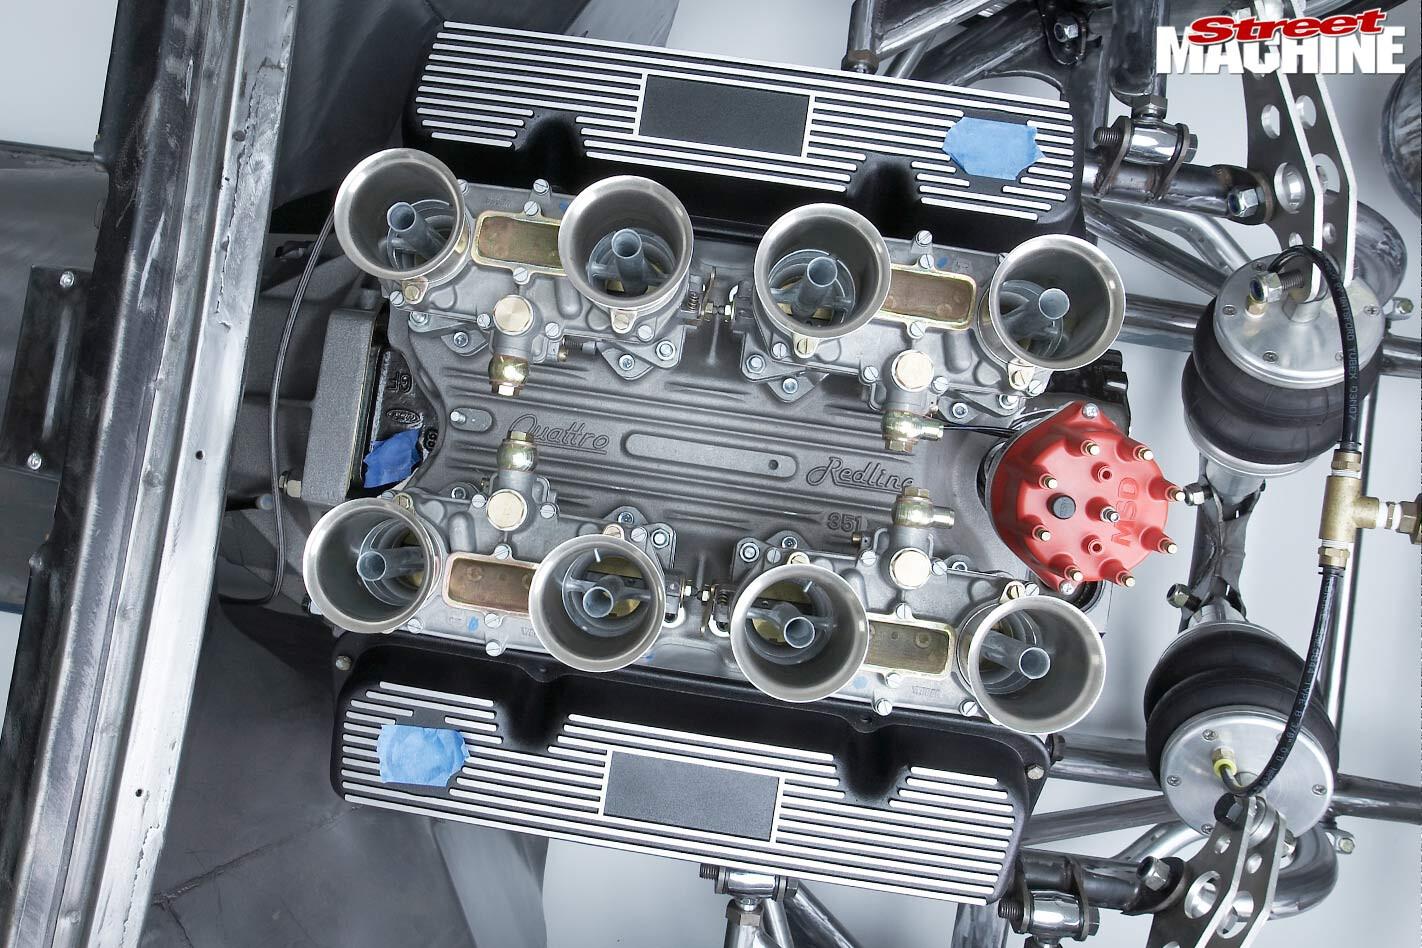 Ford Falcon XC engine